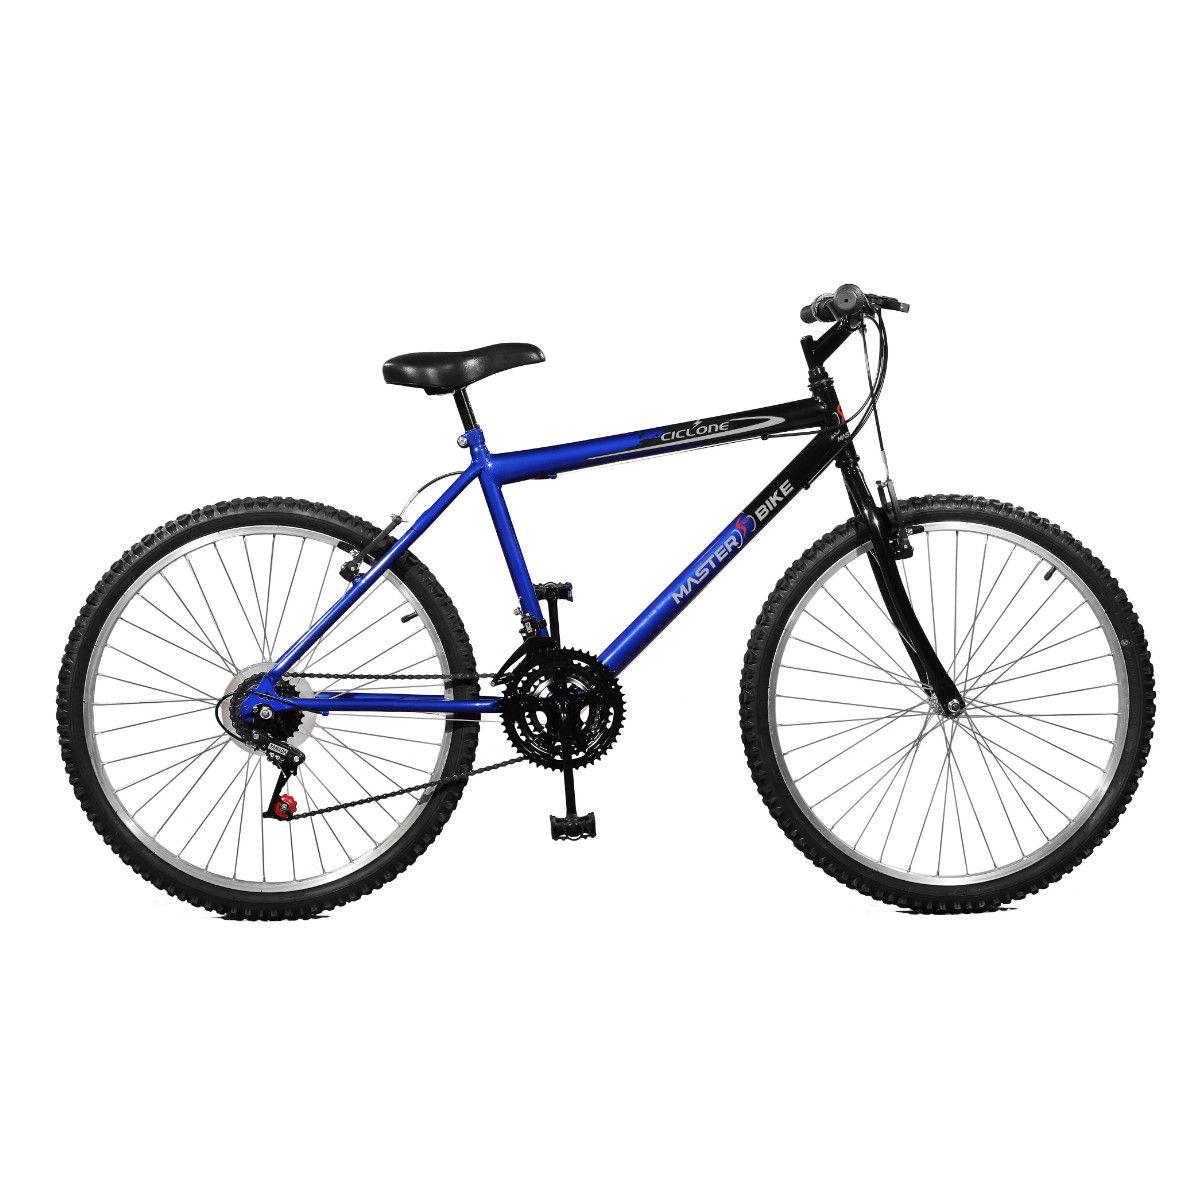 Bicicleta Master Bike Aro 26 Ciclone Plus 21 Marchas V-Brake Azul/Preto